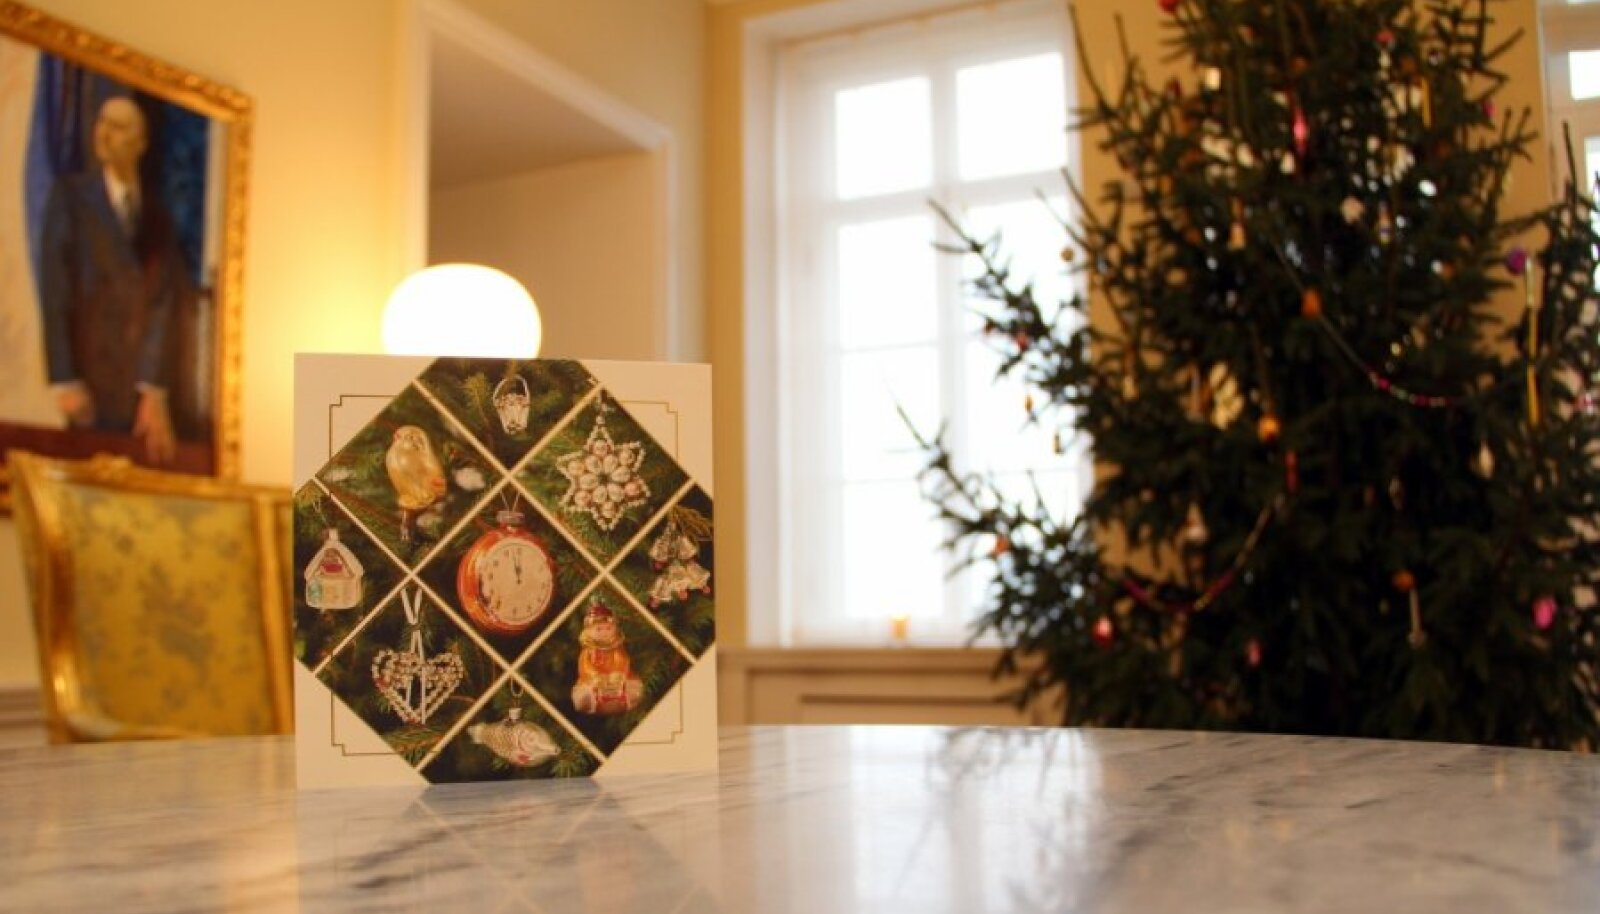 Andrus Ansipi jõulukaart